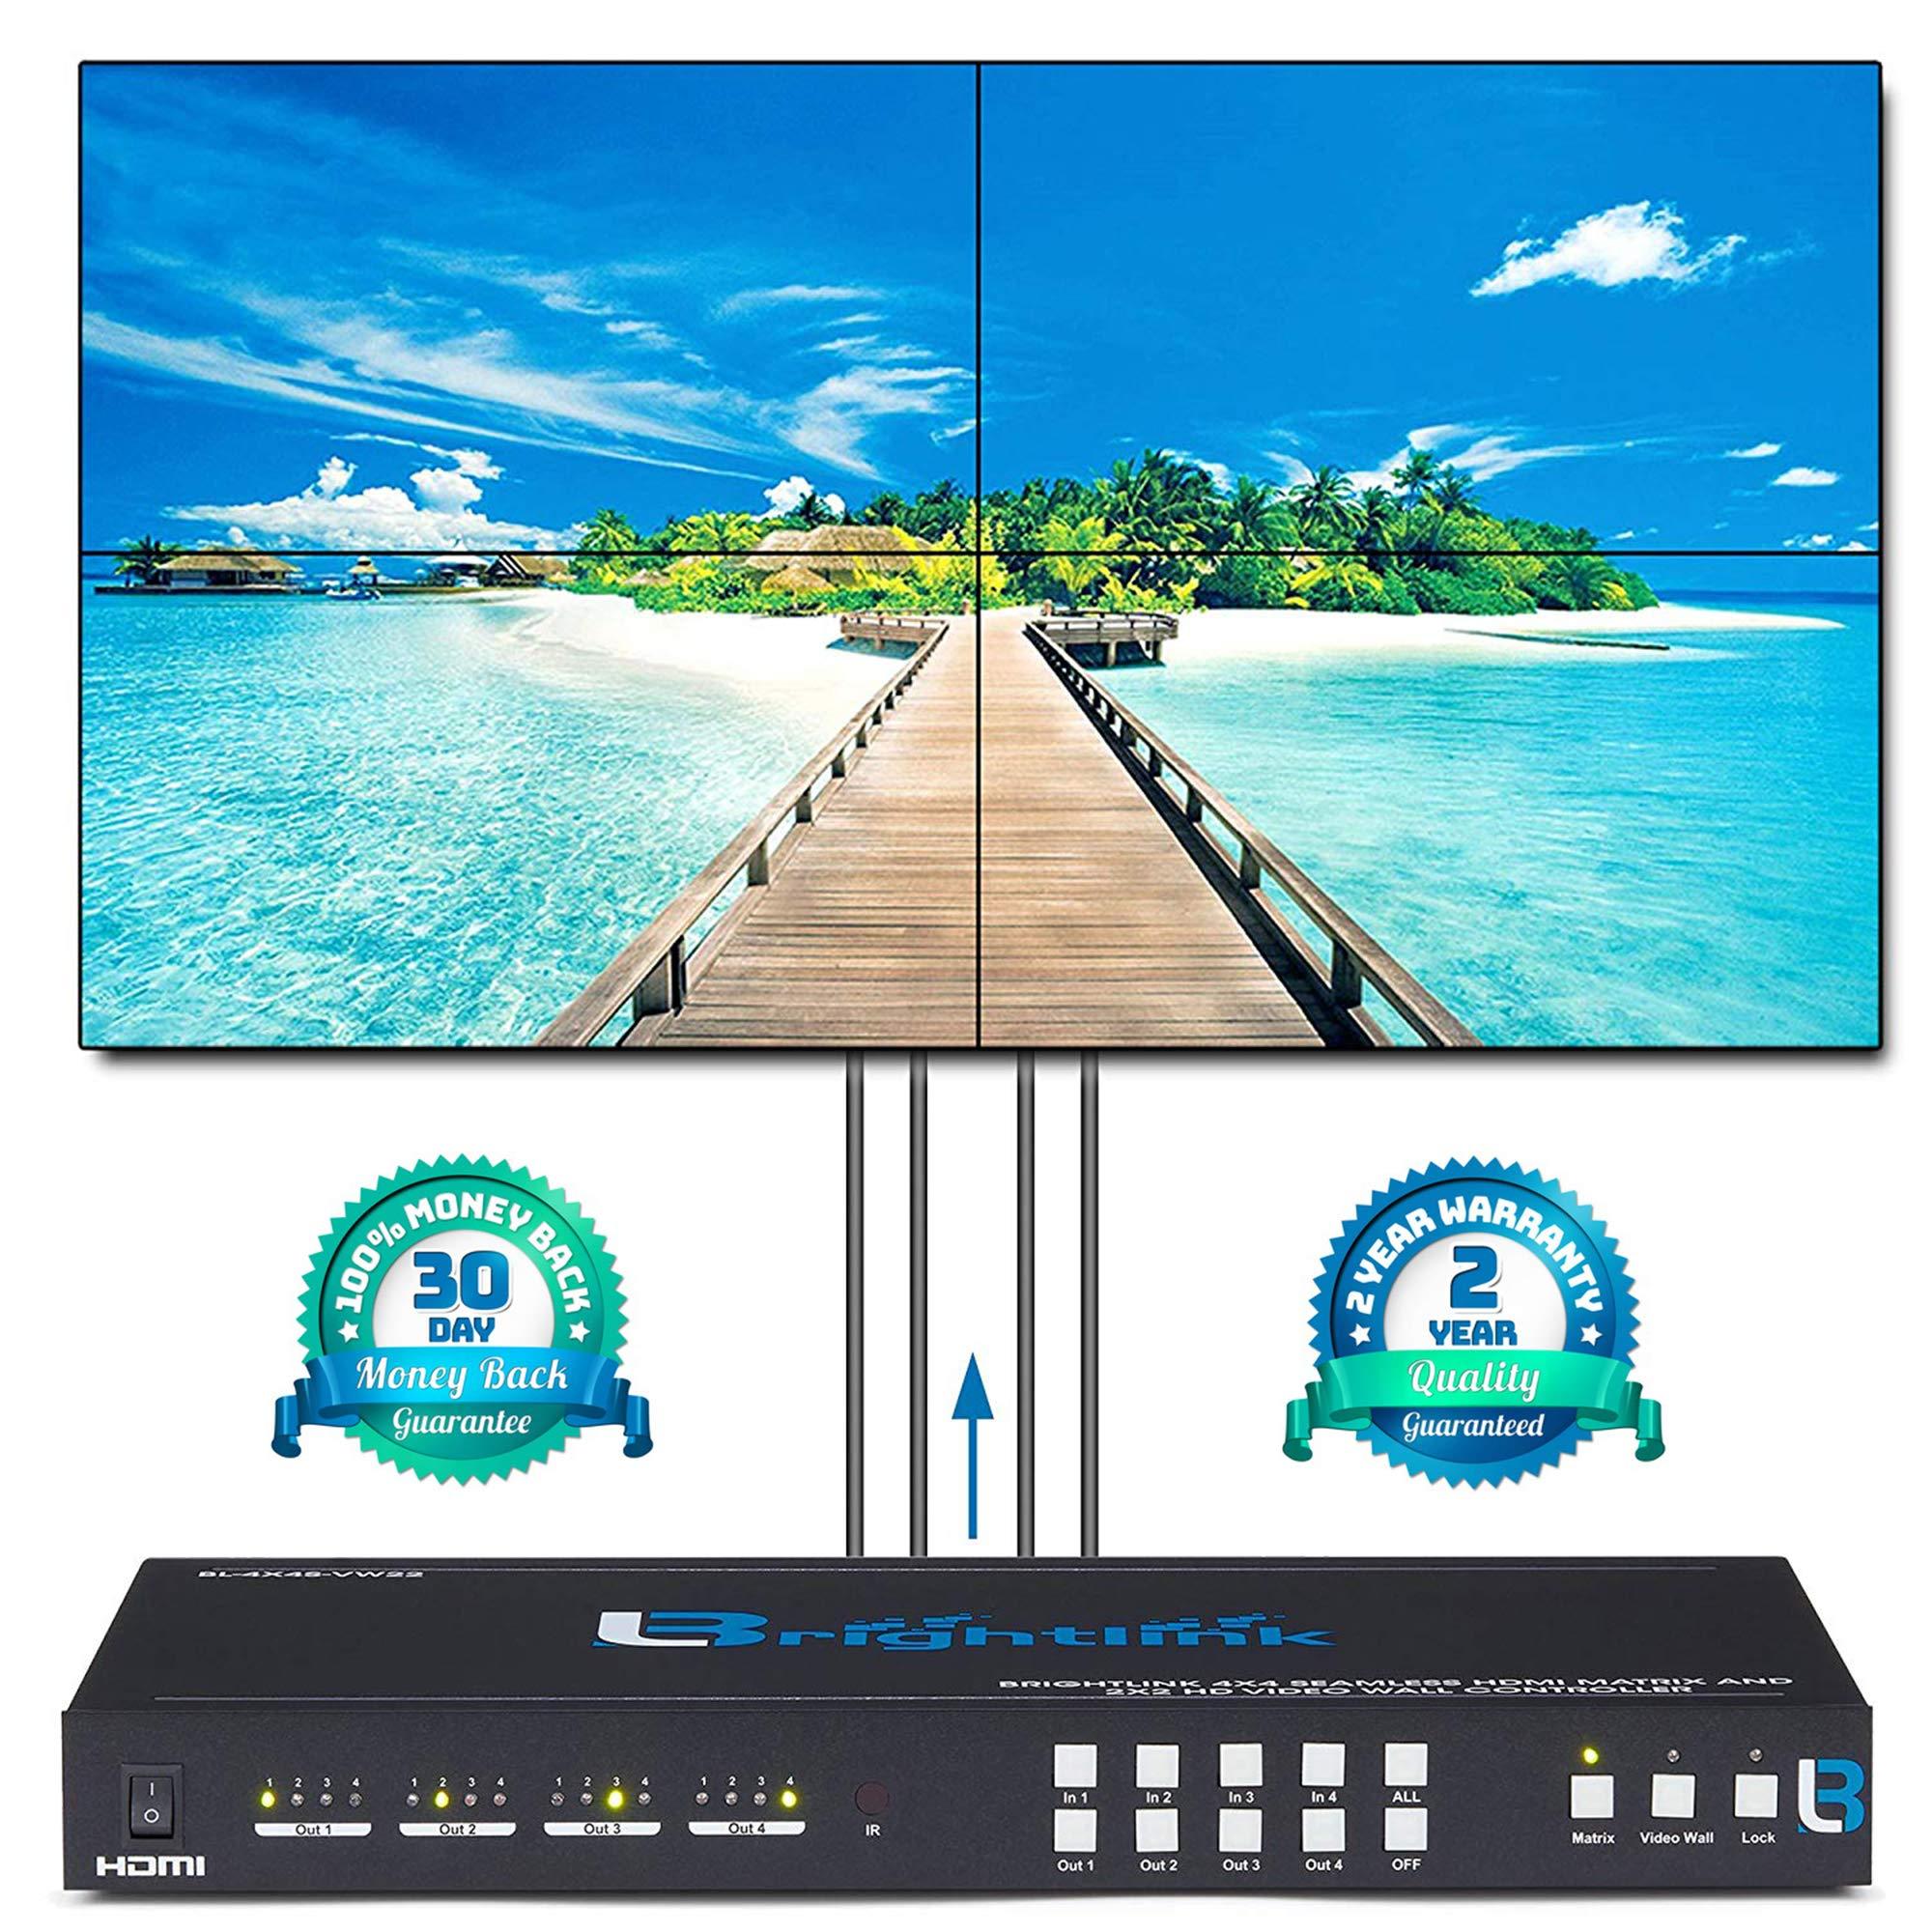 Brightlink Digital ProAV Series 2x2 Video Wall Controller HD